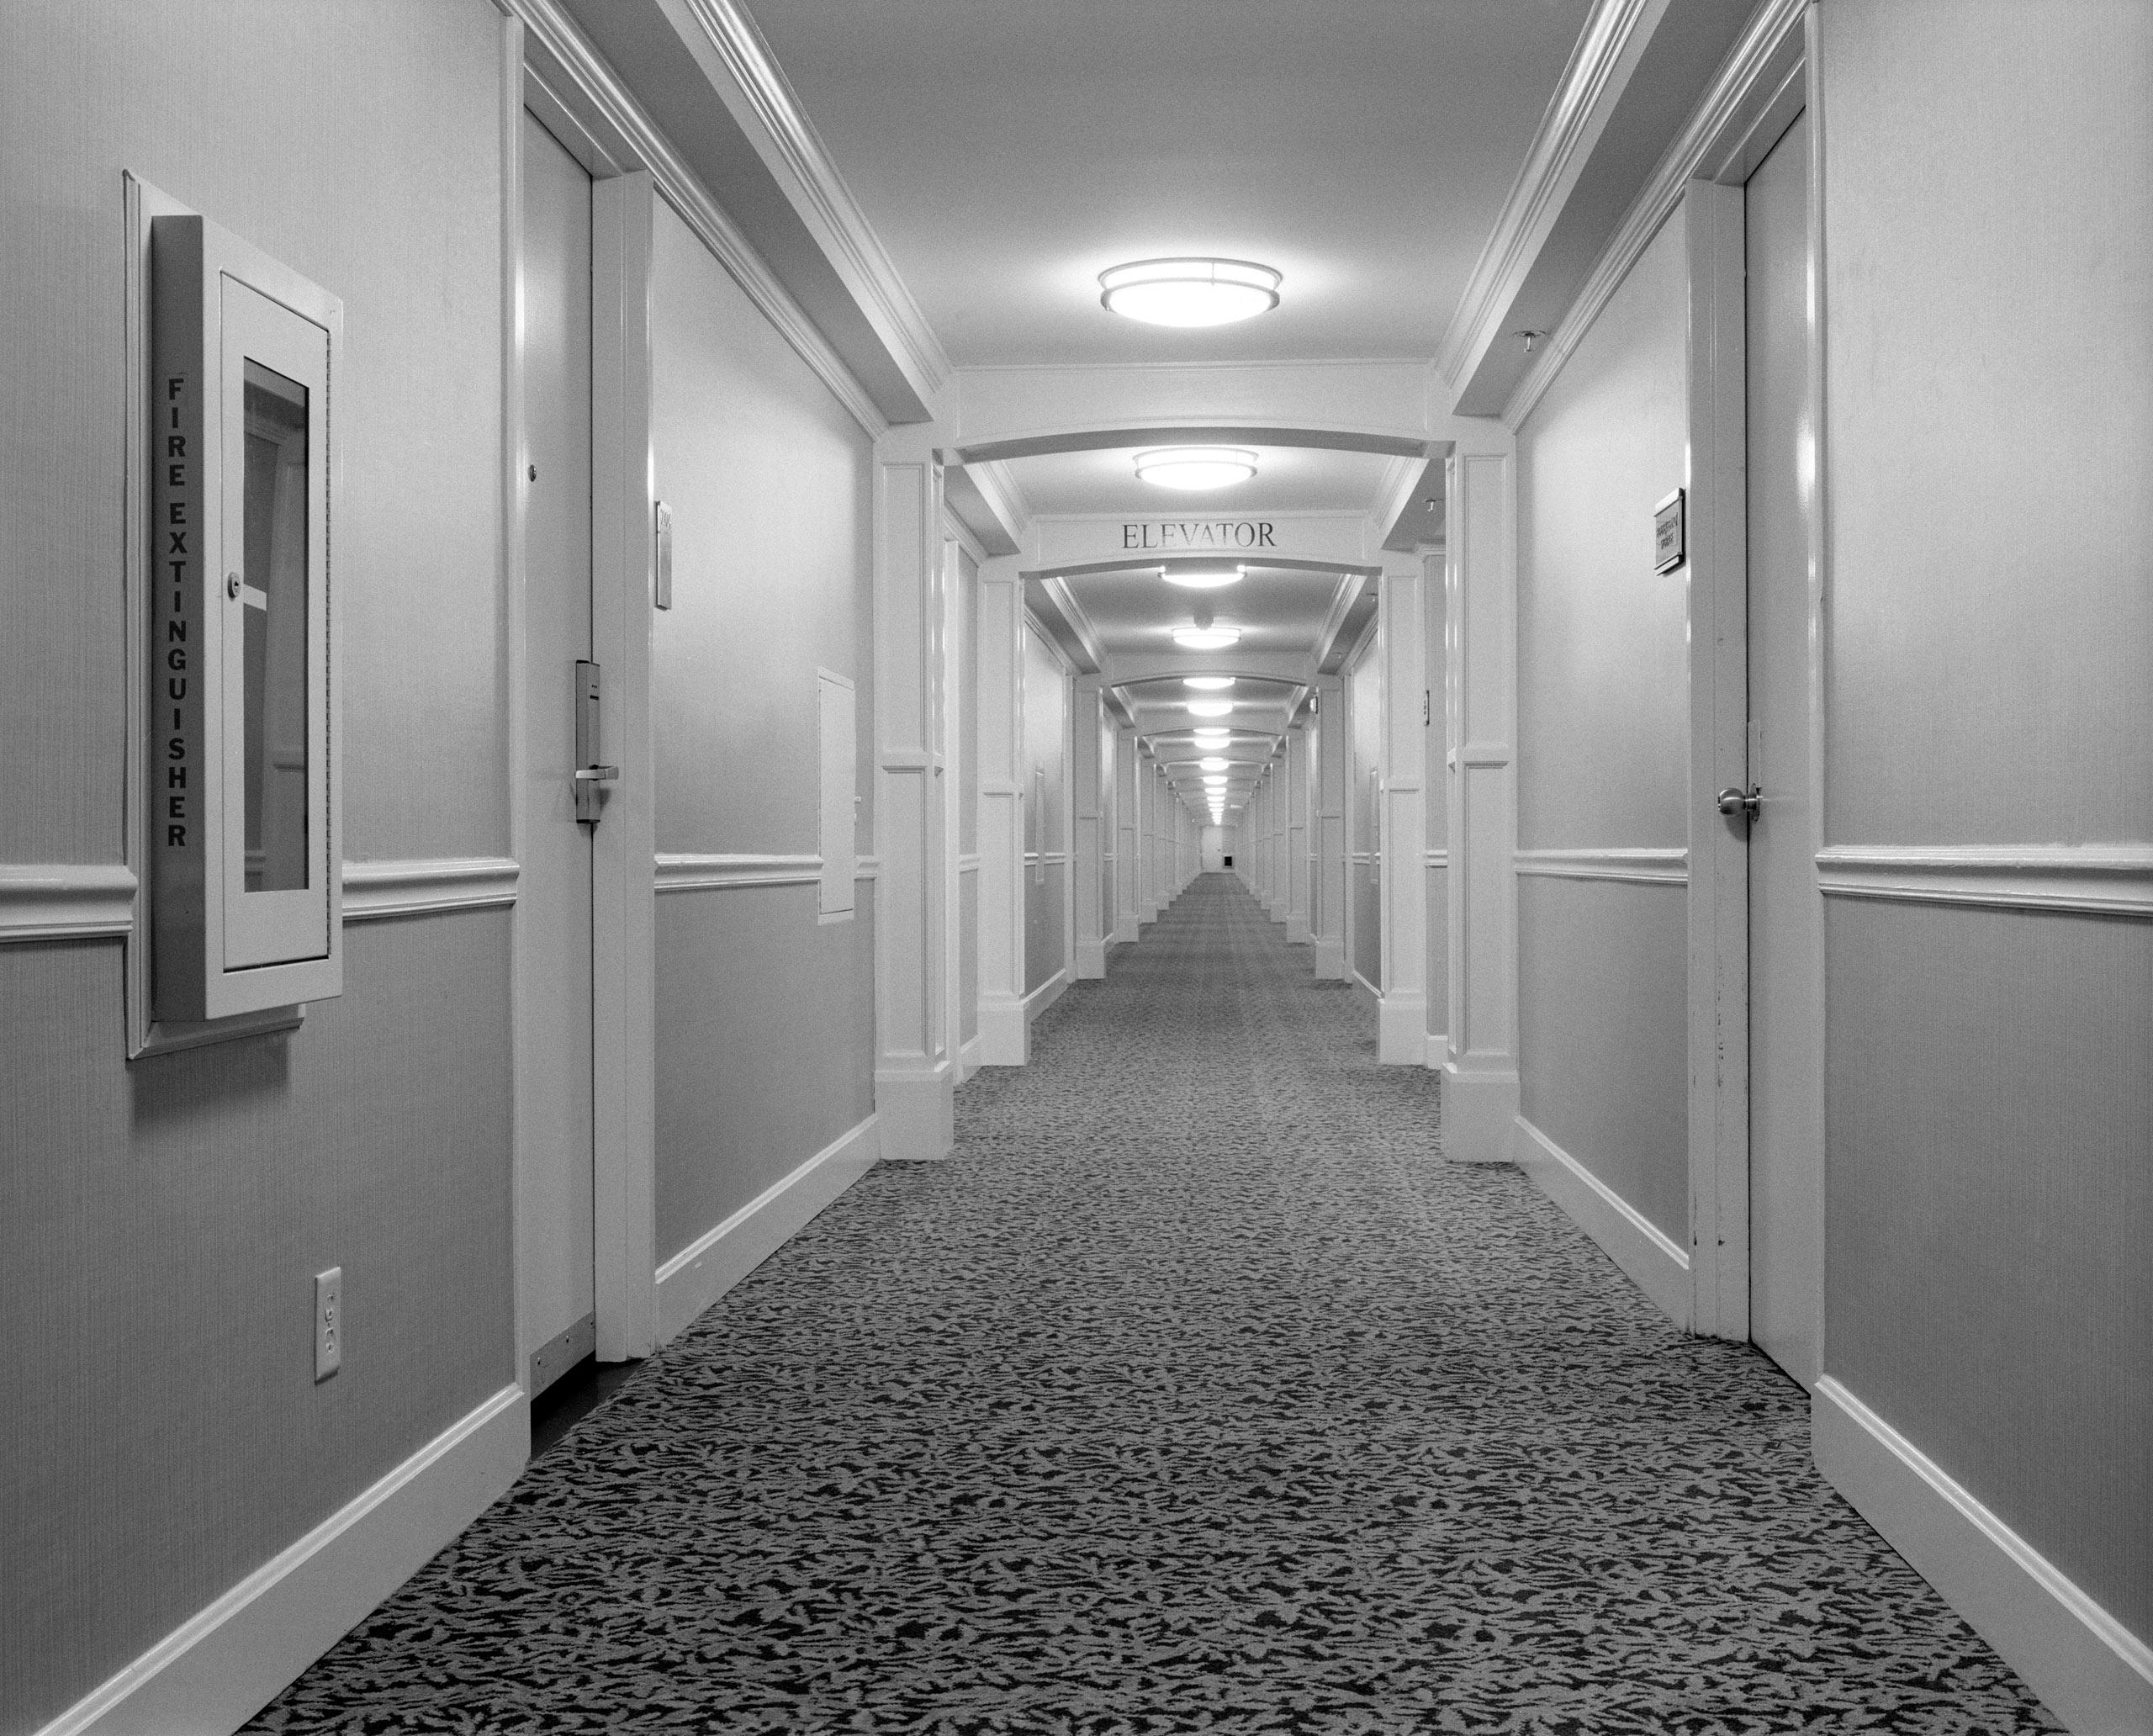 Hershey Hotel, Pennsylvania, U.S.A., 2010.